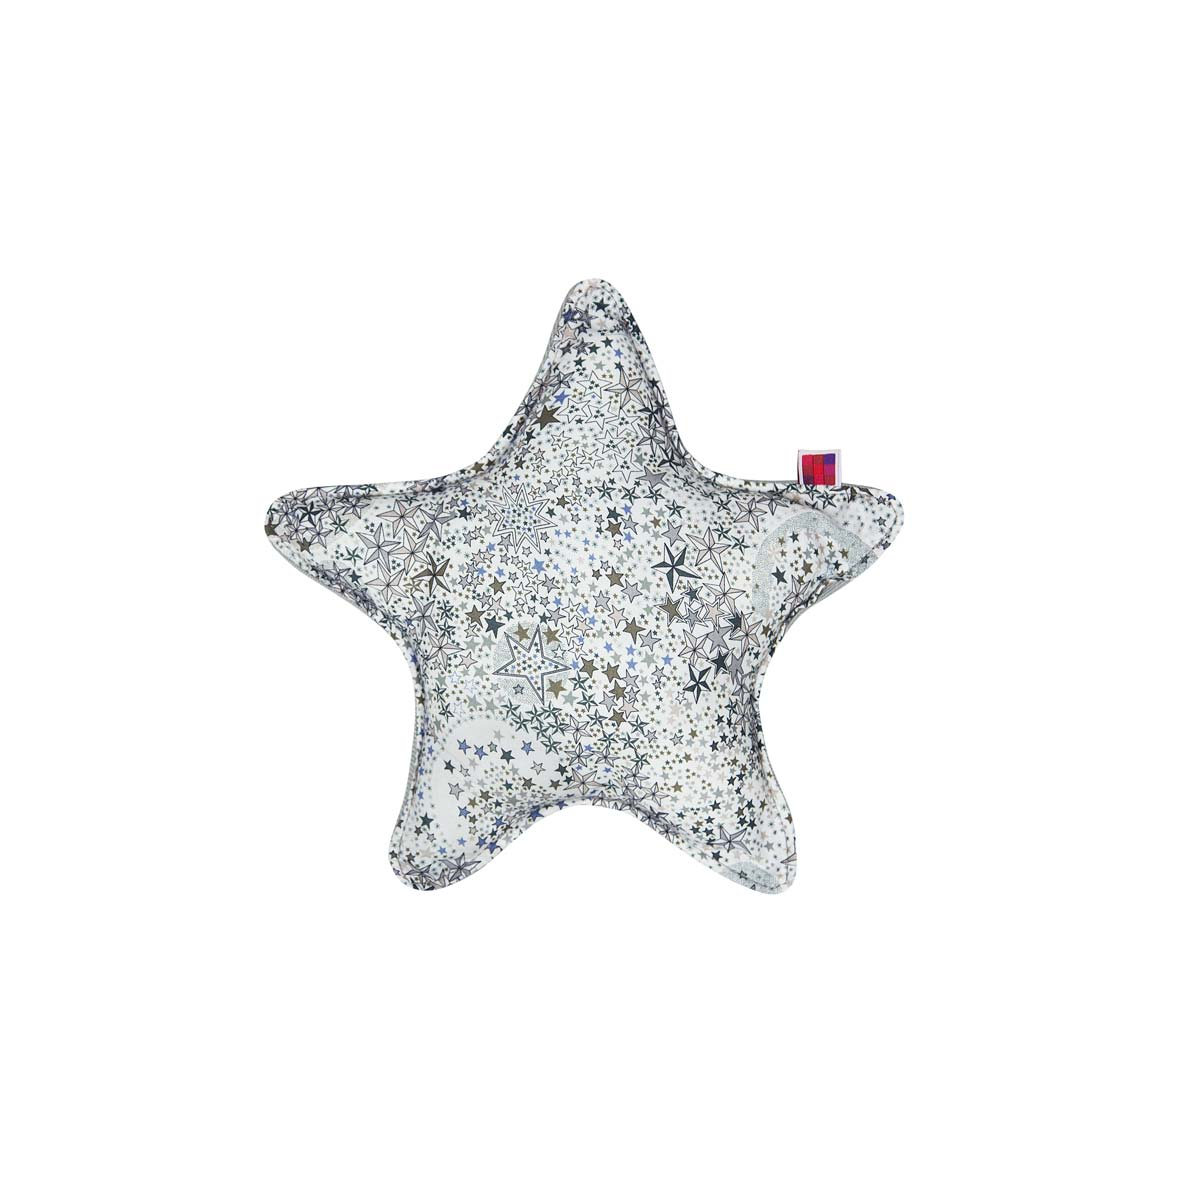 Almofada Star P Tecido Adelajda Estrela 01